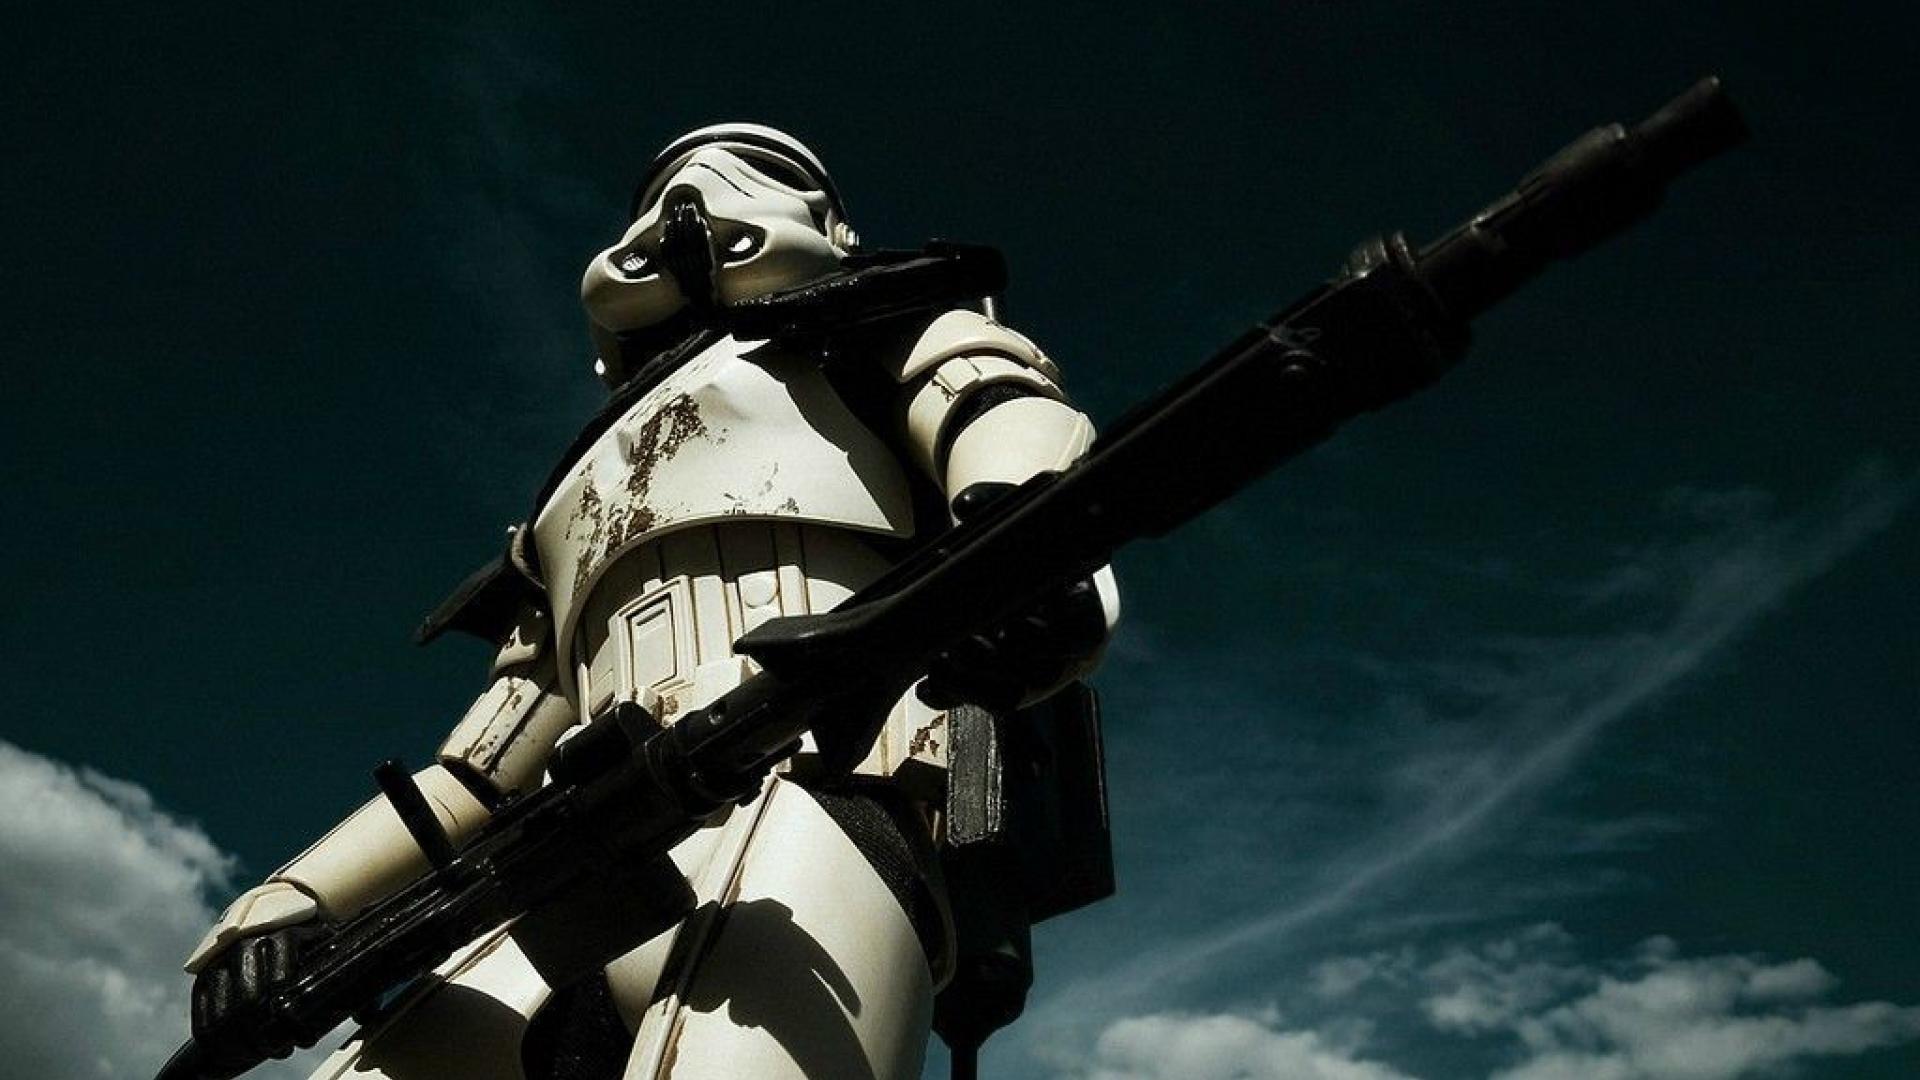 Star wars stormtroopers galactic empire storm trooper wallpaper .